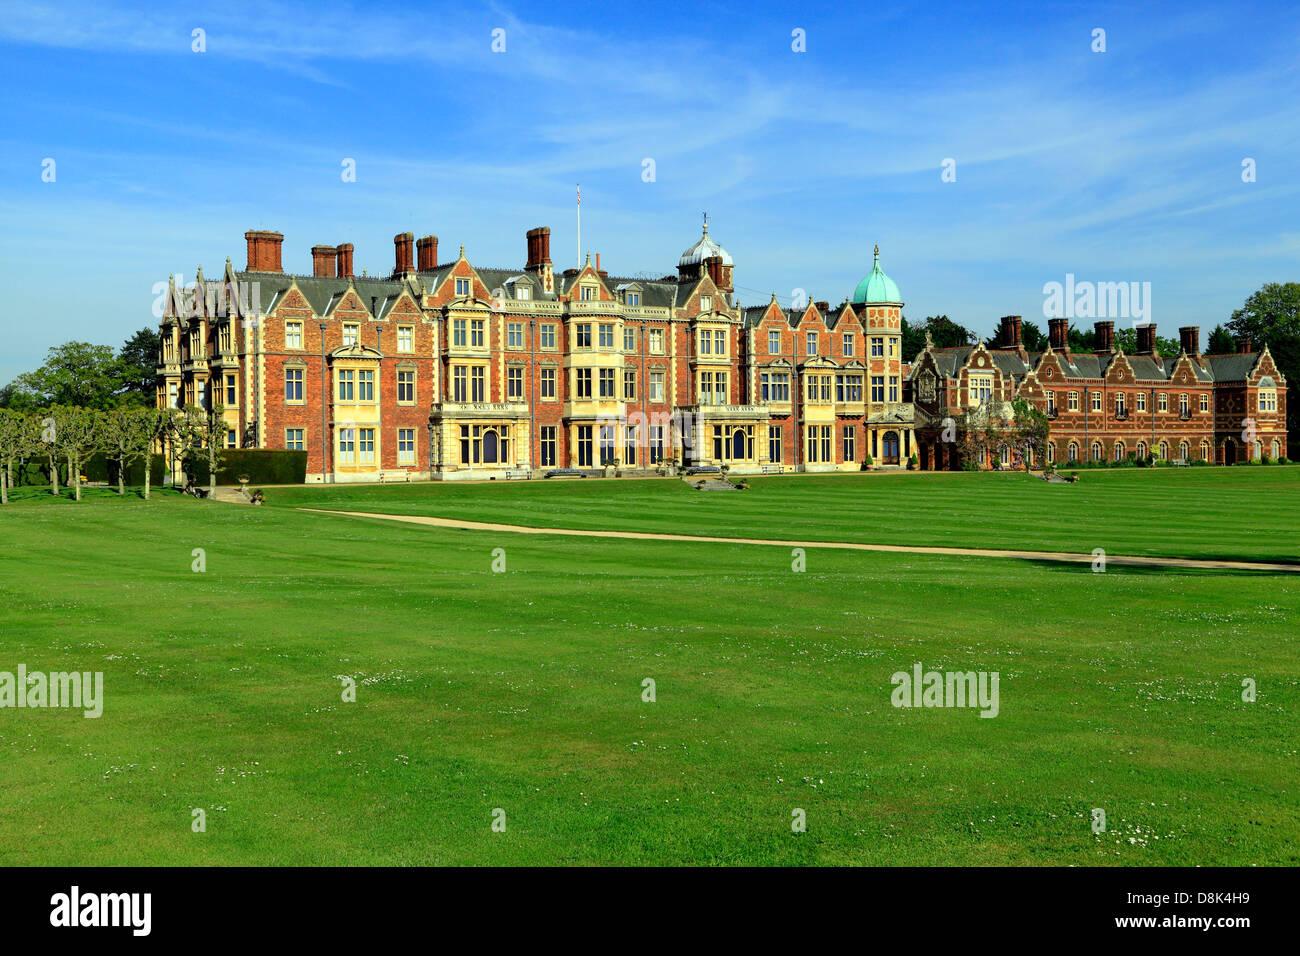 Casa Sandringham, Norfolk, retiro campestre de S.M. la reina británica del siglo XIX, la arquitectura Victoriana, Inglaterra Foto de stock